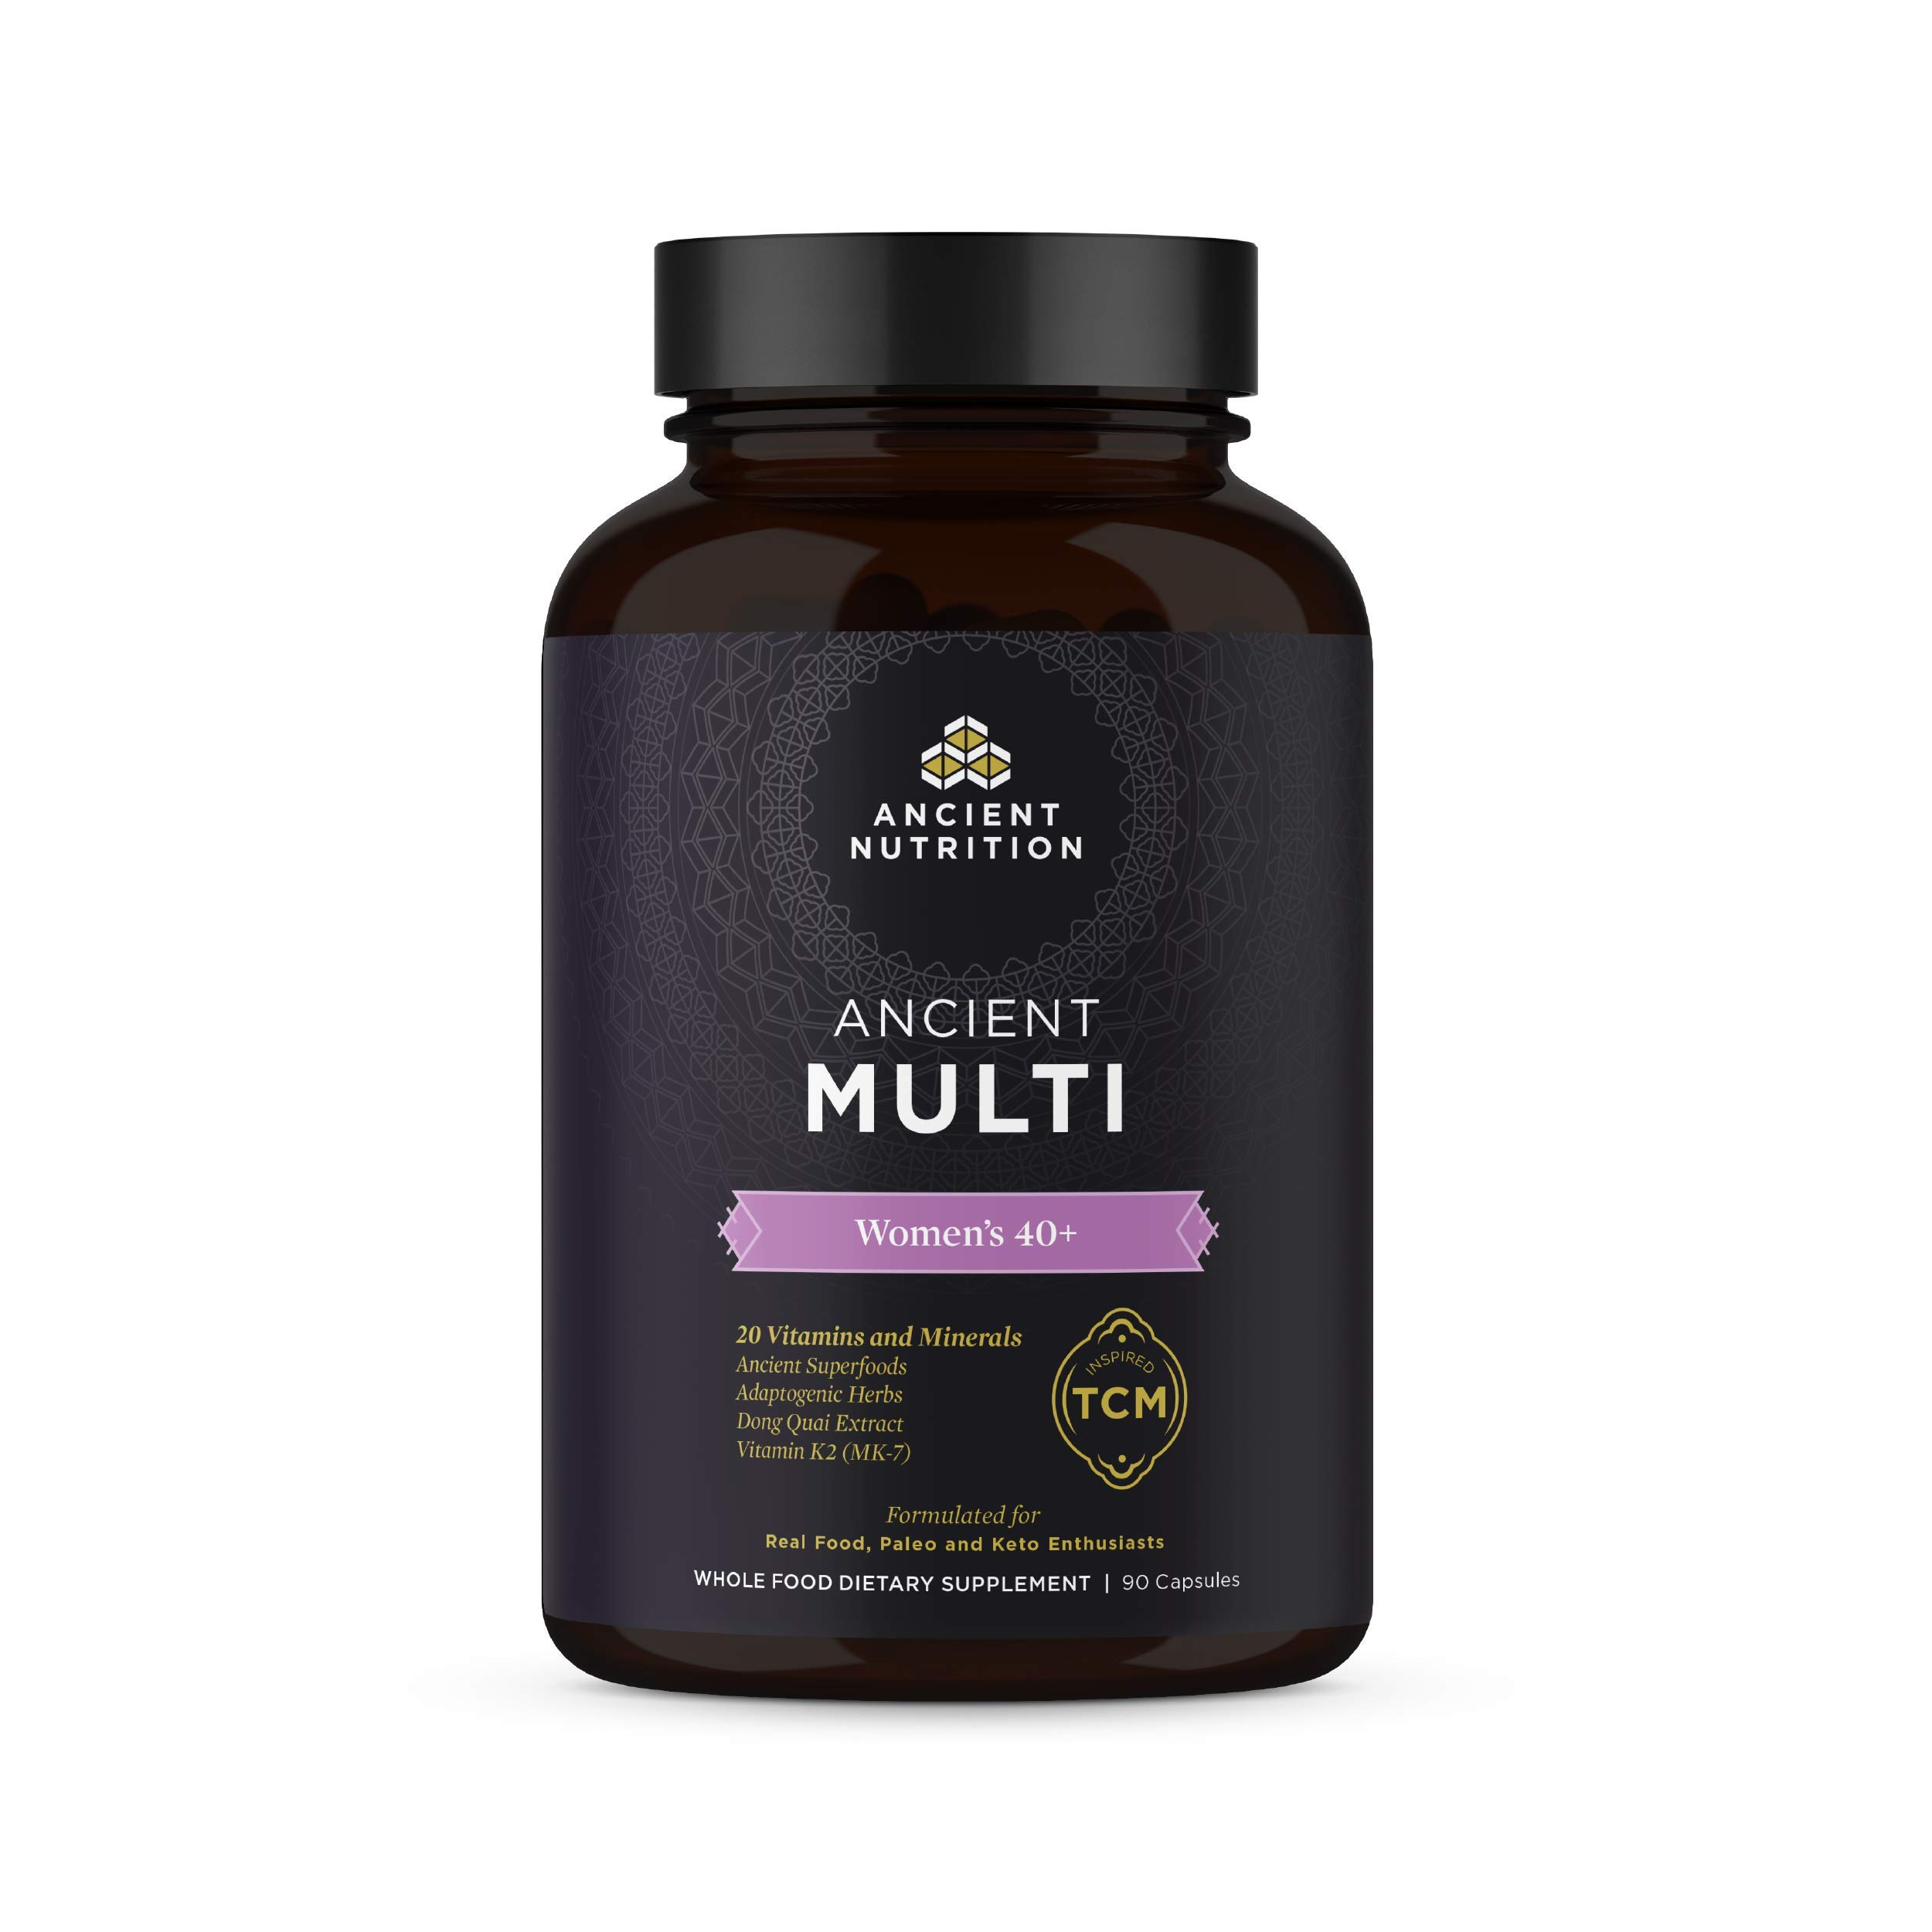 Ancient Nutrition, Ancient Multi Women's 40+ - 20 Vitamins & Minerals, Adaptogenic Herbs, Paleo & Keto Friendly, 90 Capsules